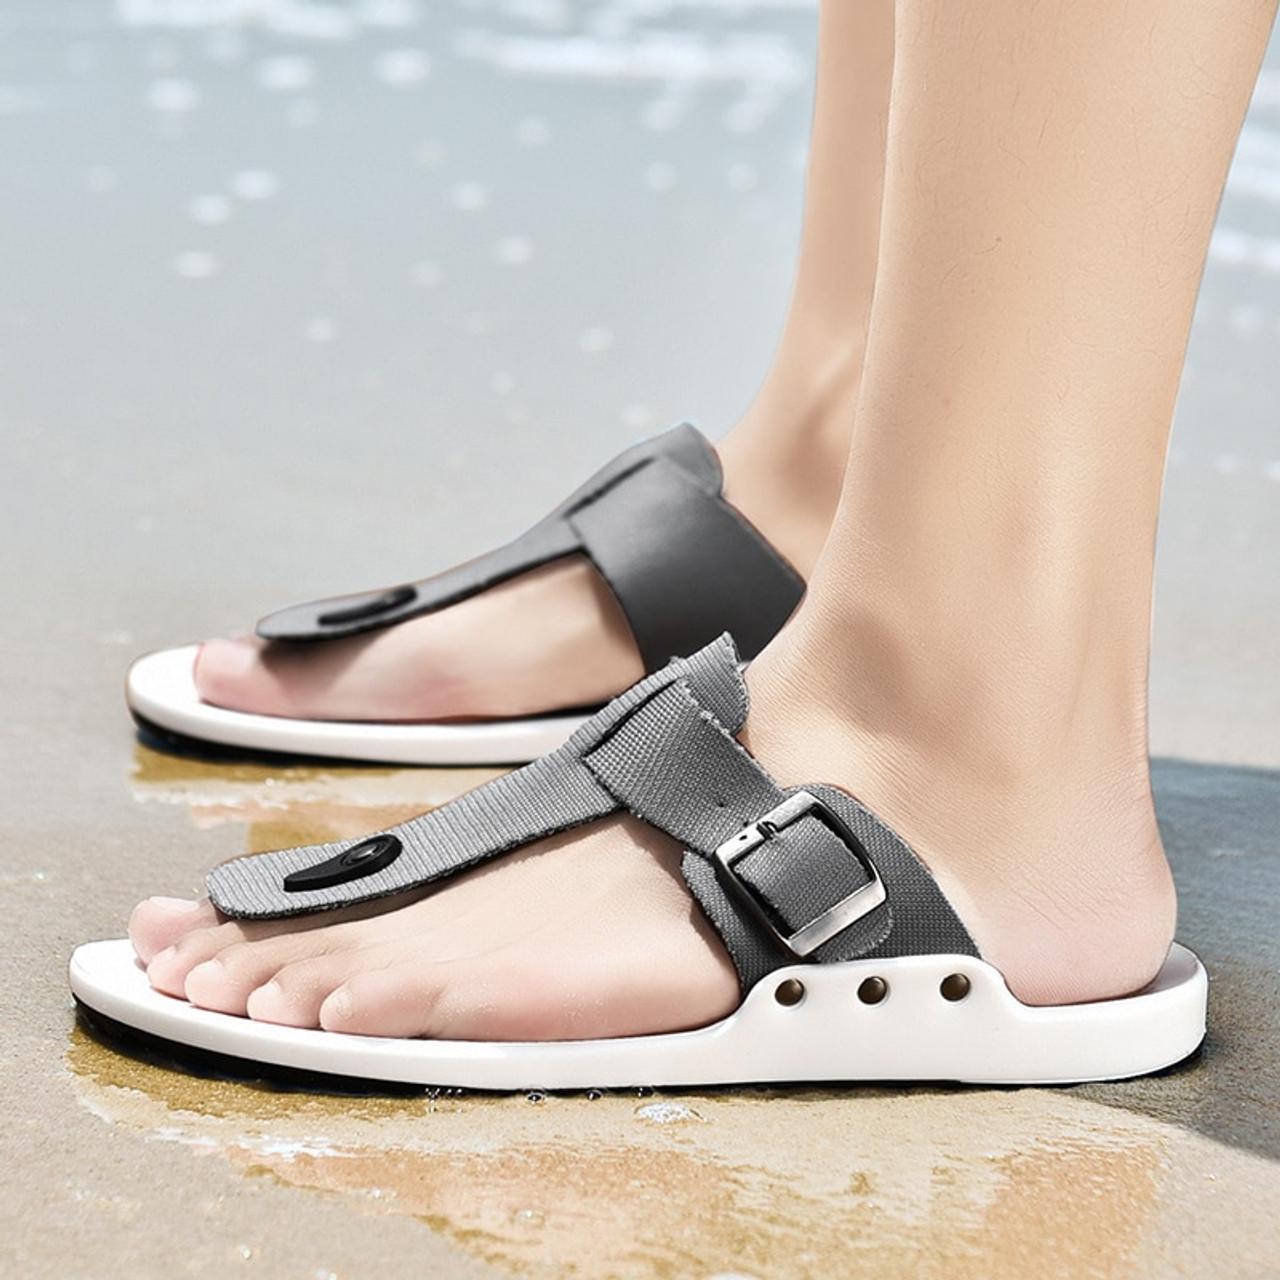 new specials online for sale superior quality 2018 Canvas Sandals Men Black Blue Grey Flip Flops Casual Flat ...